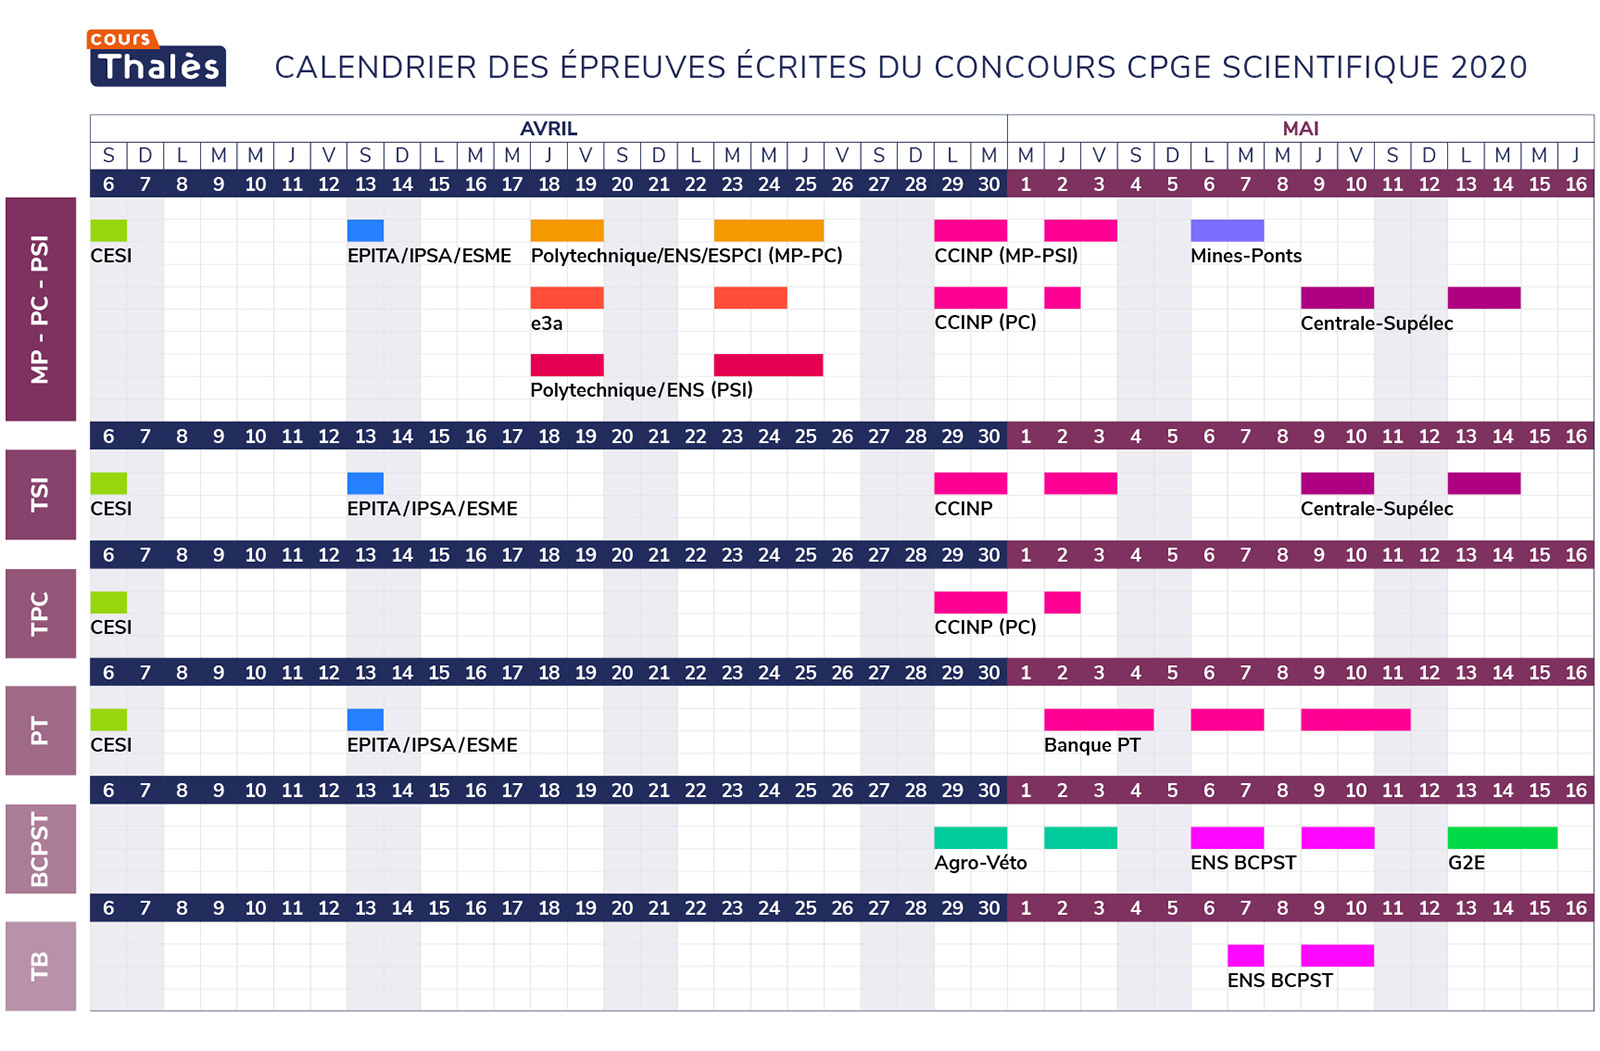 Calendrier Concours Cpge 2019.Calendrier Des Concours Cpge Scientifique